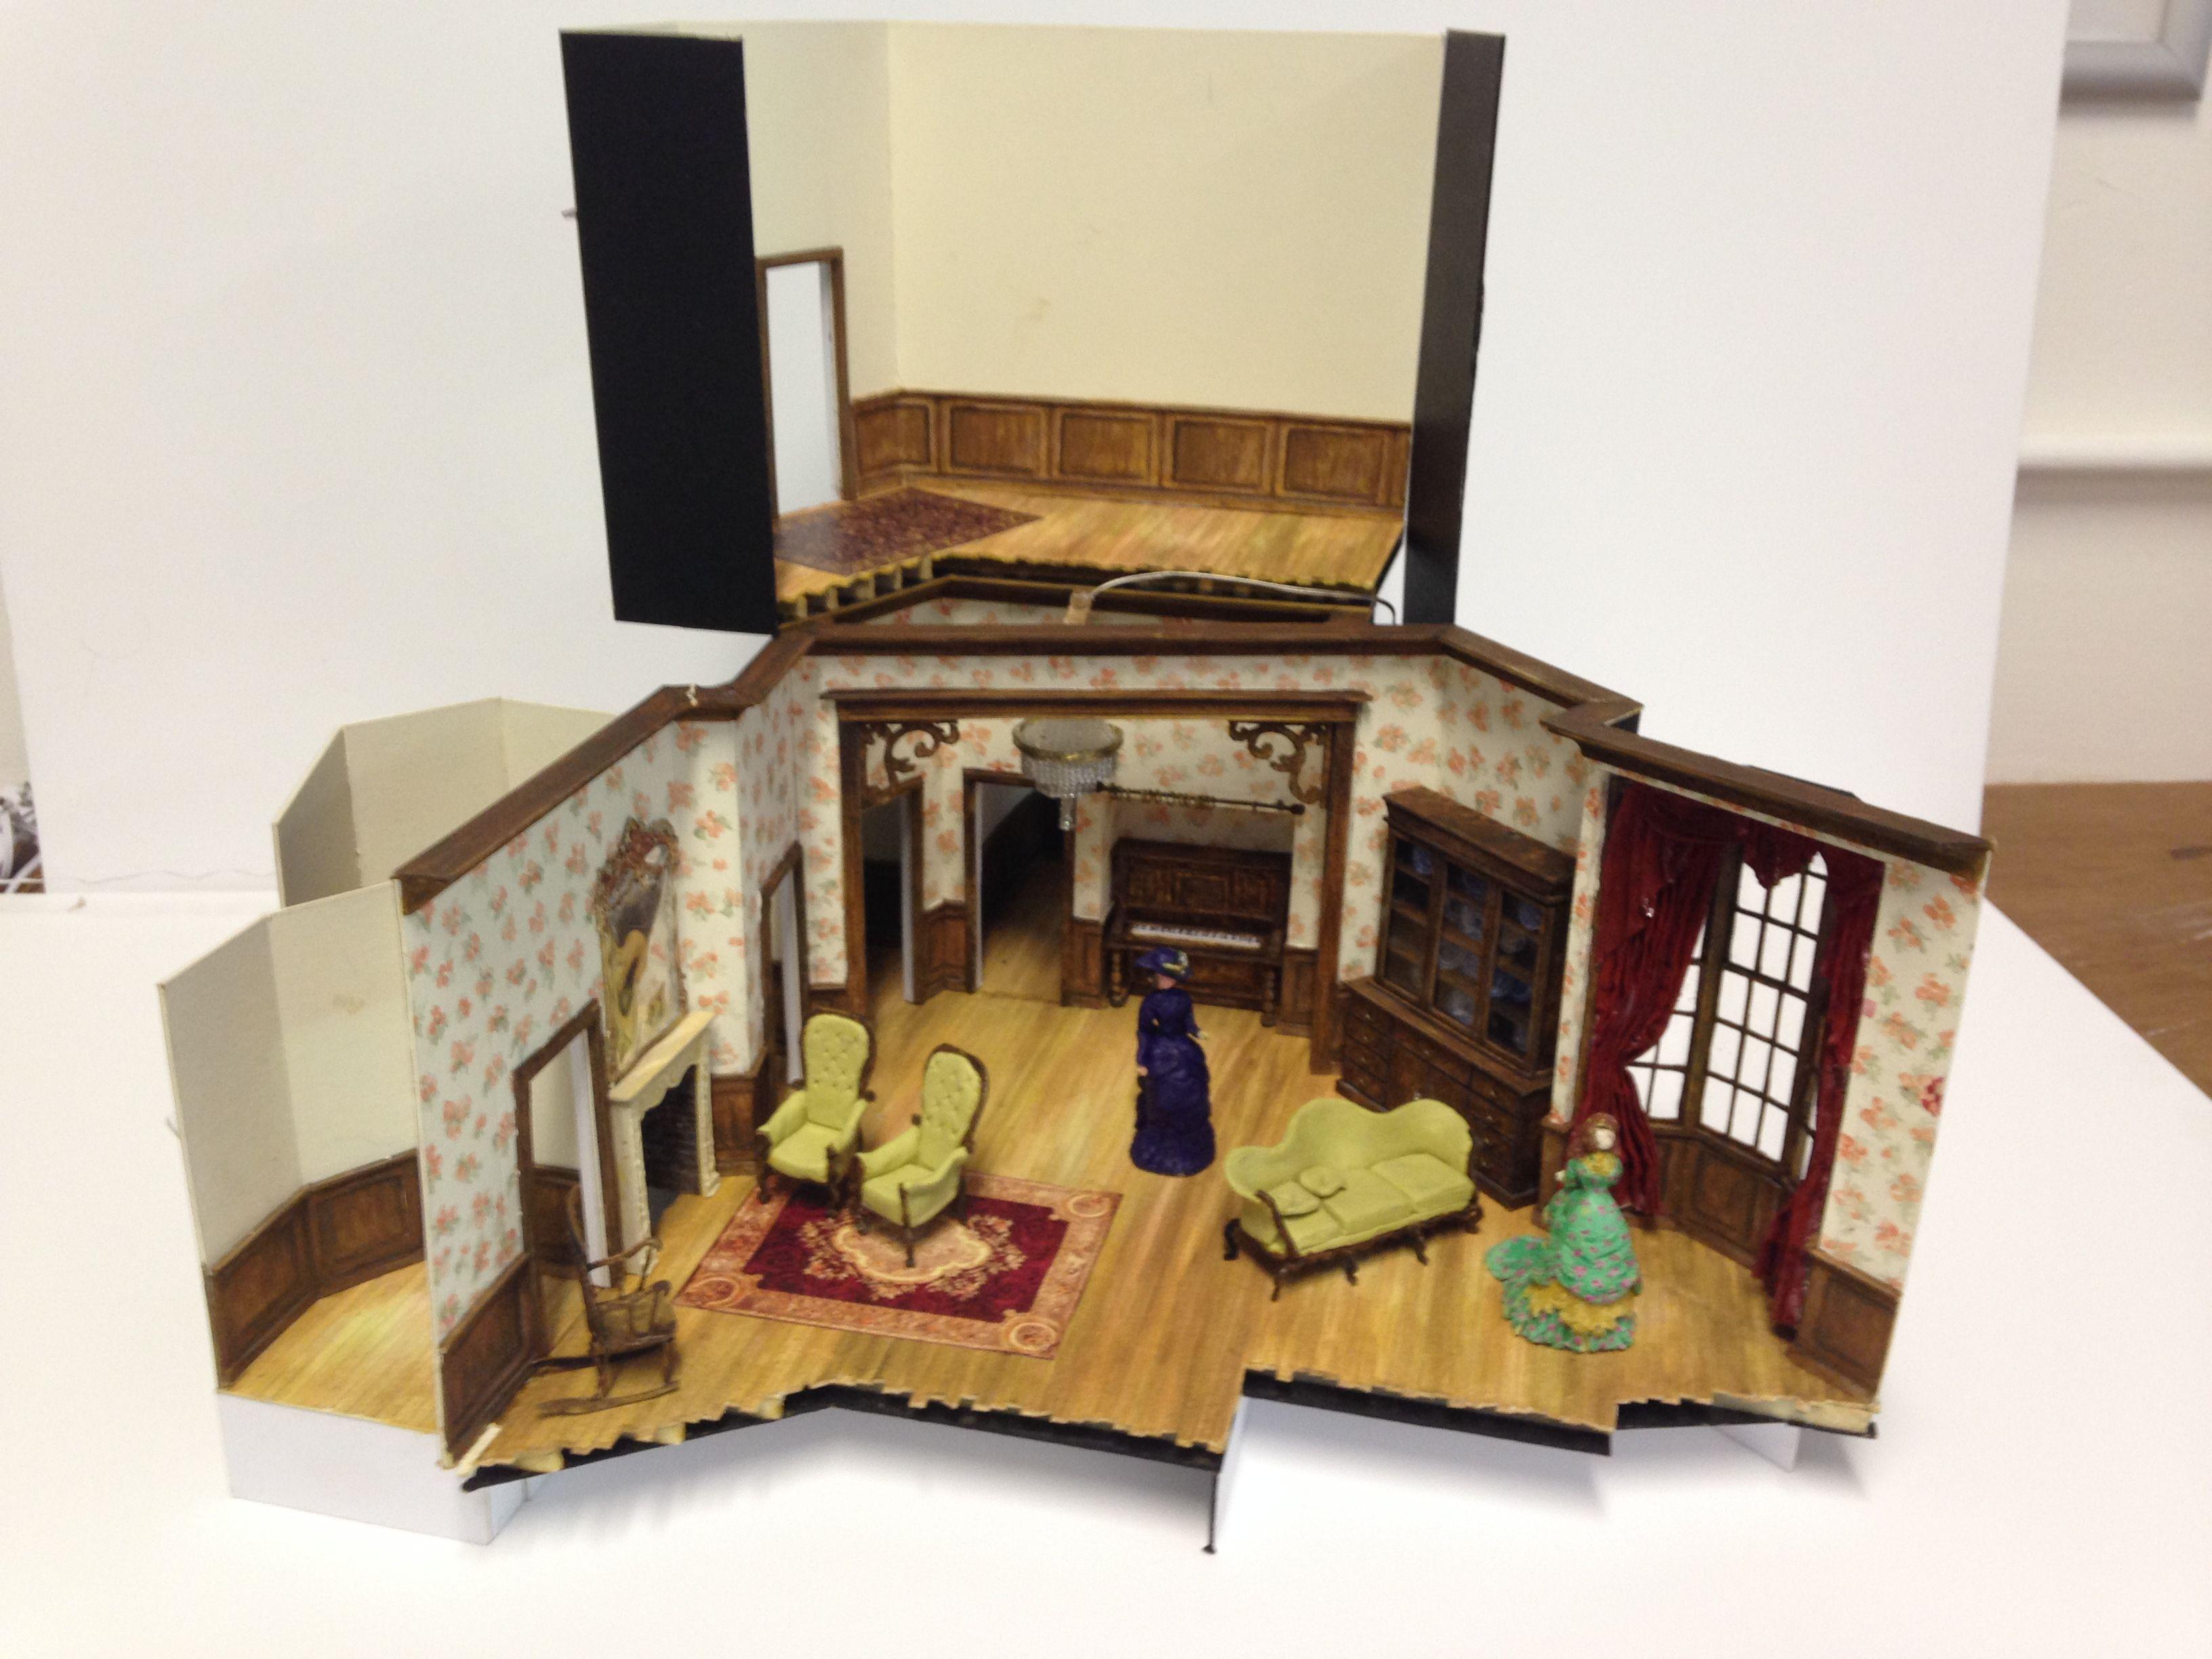 1 25 Model For Henrik Ibsen S A Doll S House Based On The